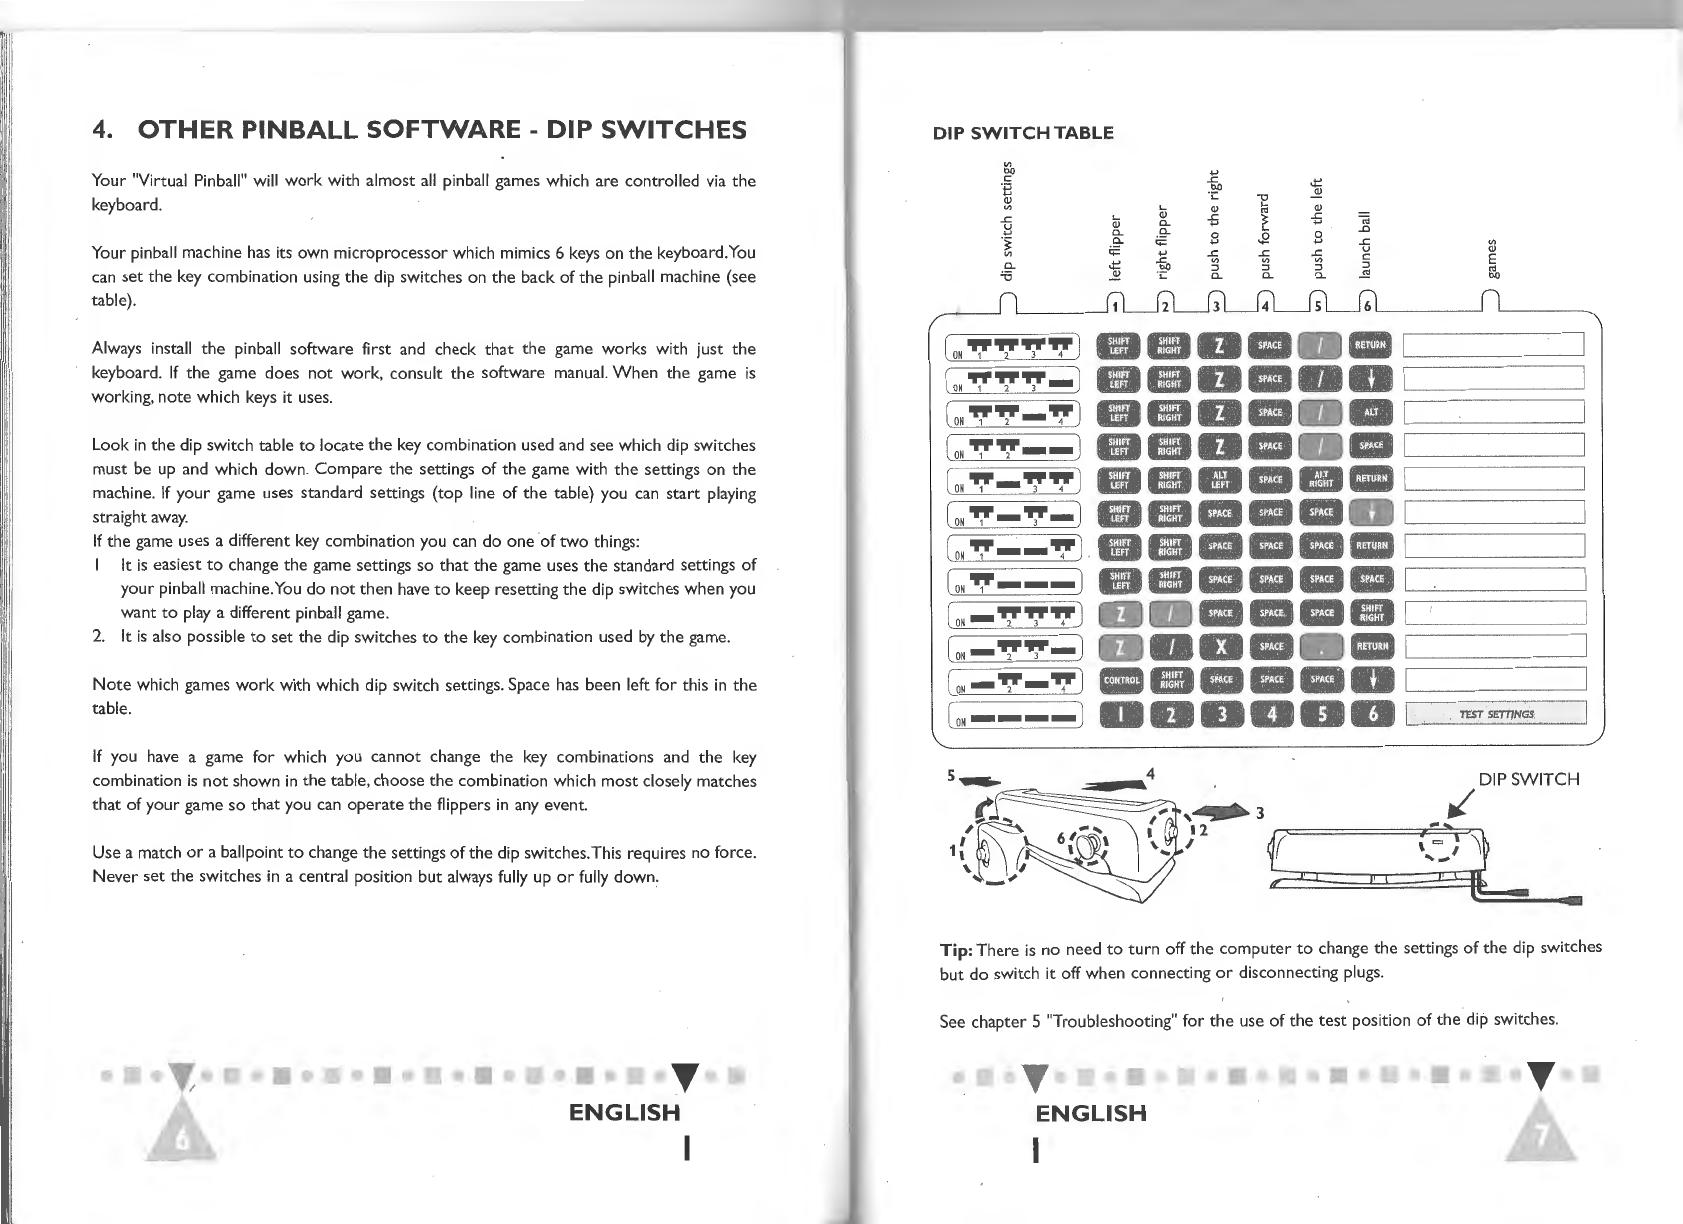 Handleiding Philips Virtual Pinball (pagina 5 van 18) (English)